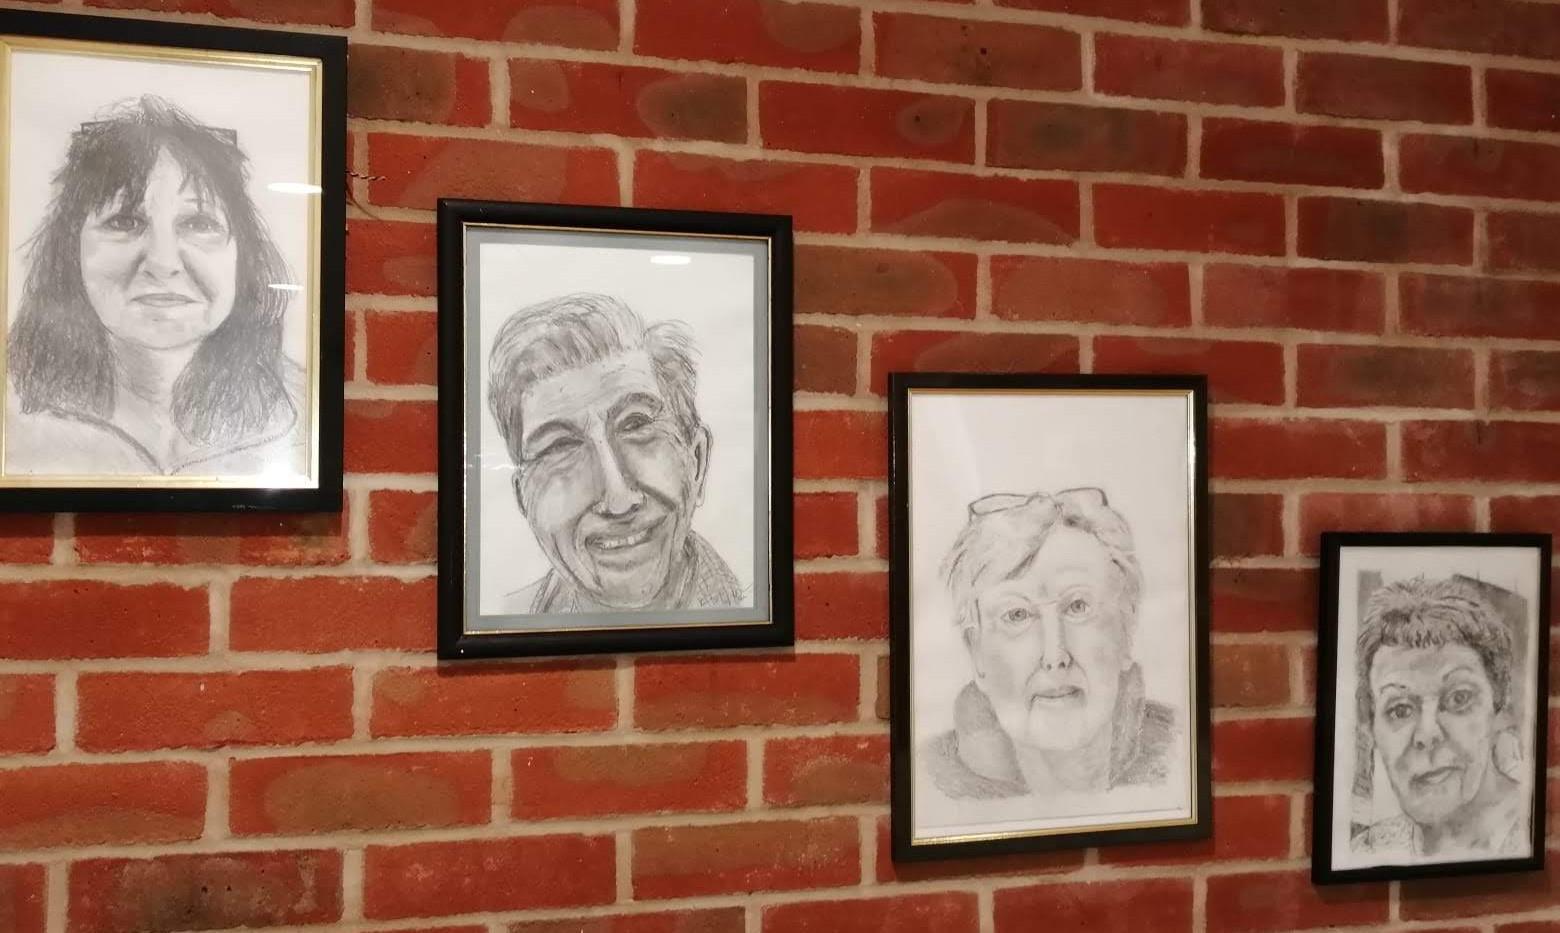 Pencil on self portraits